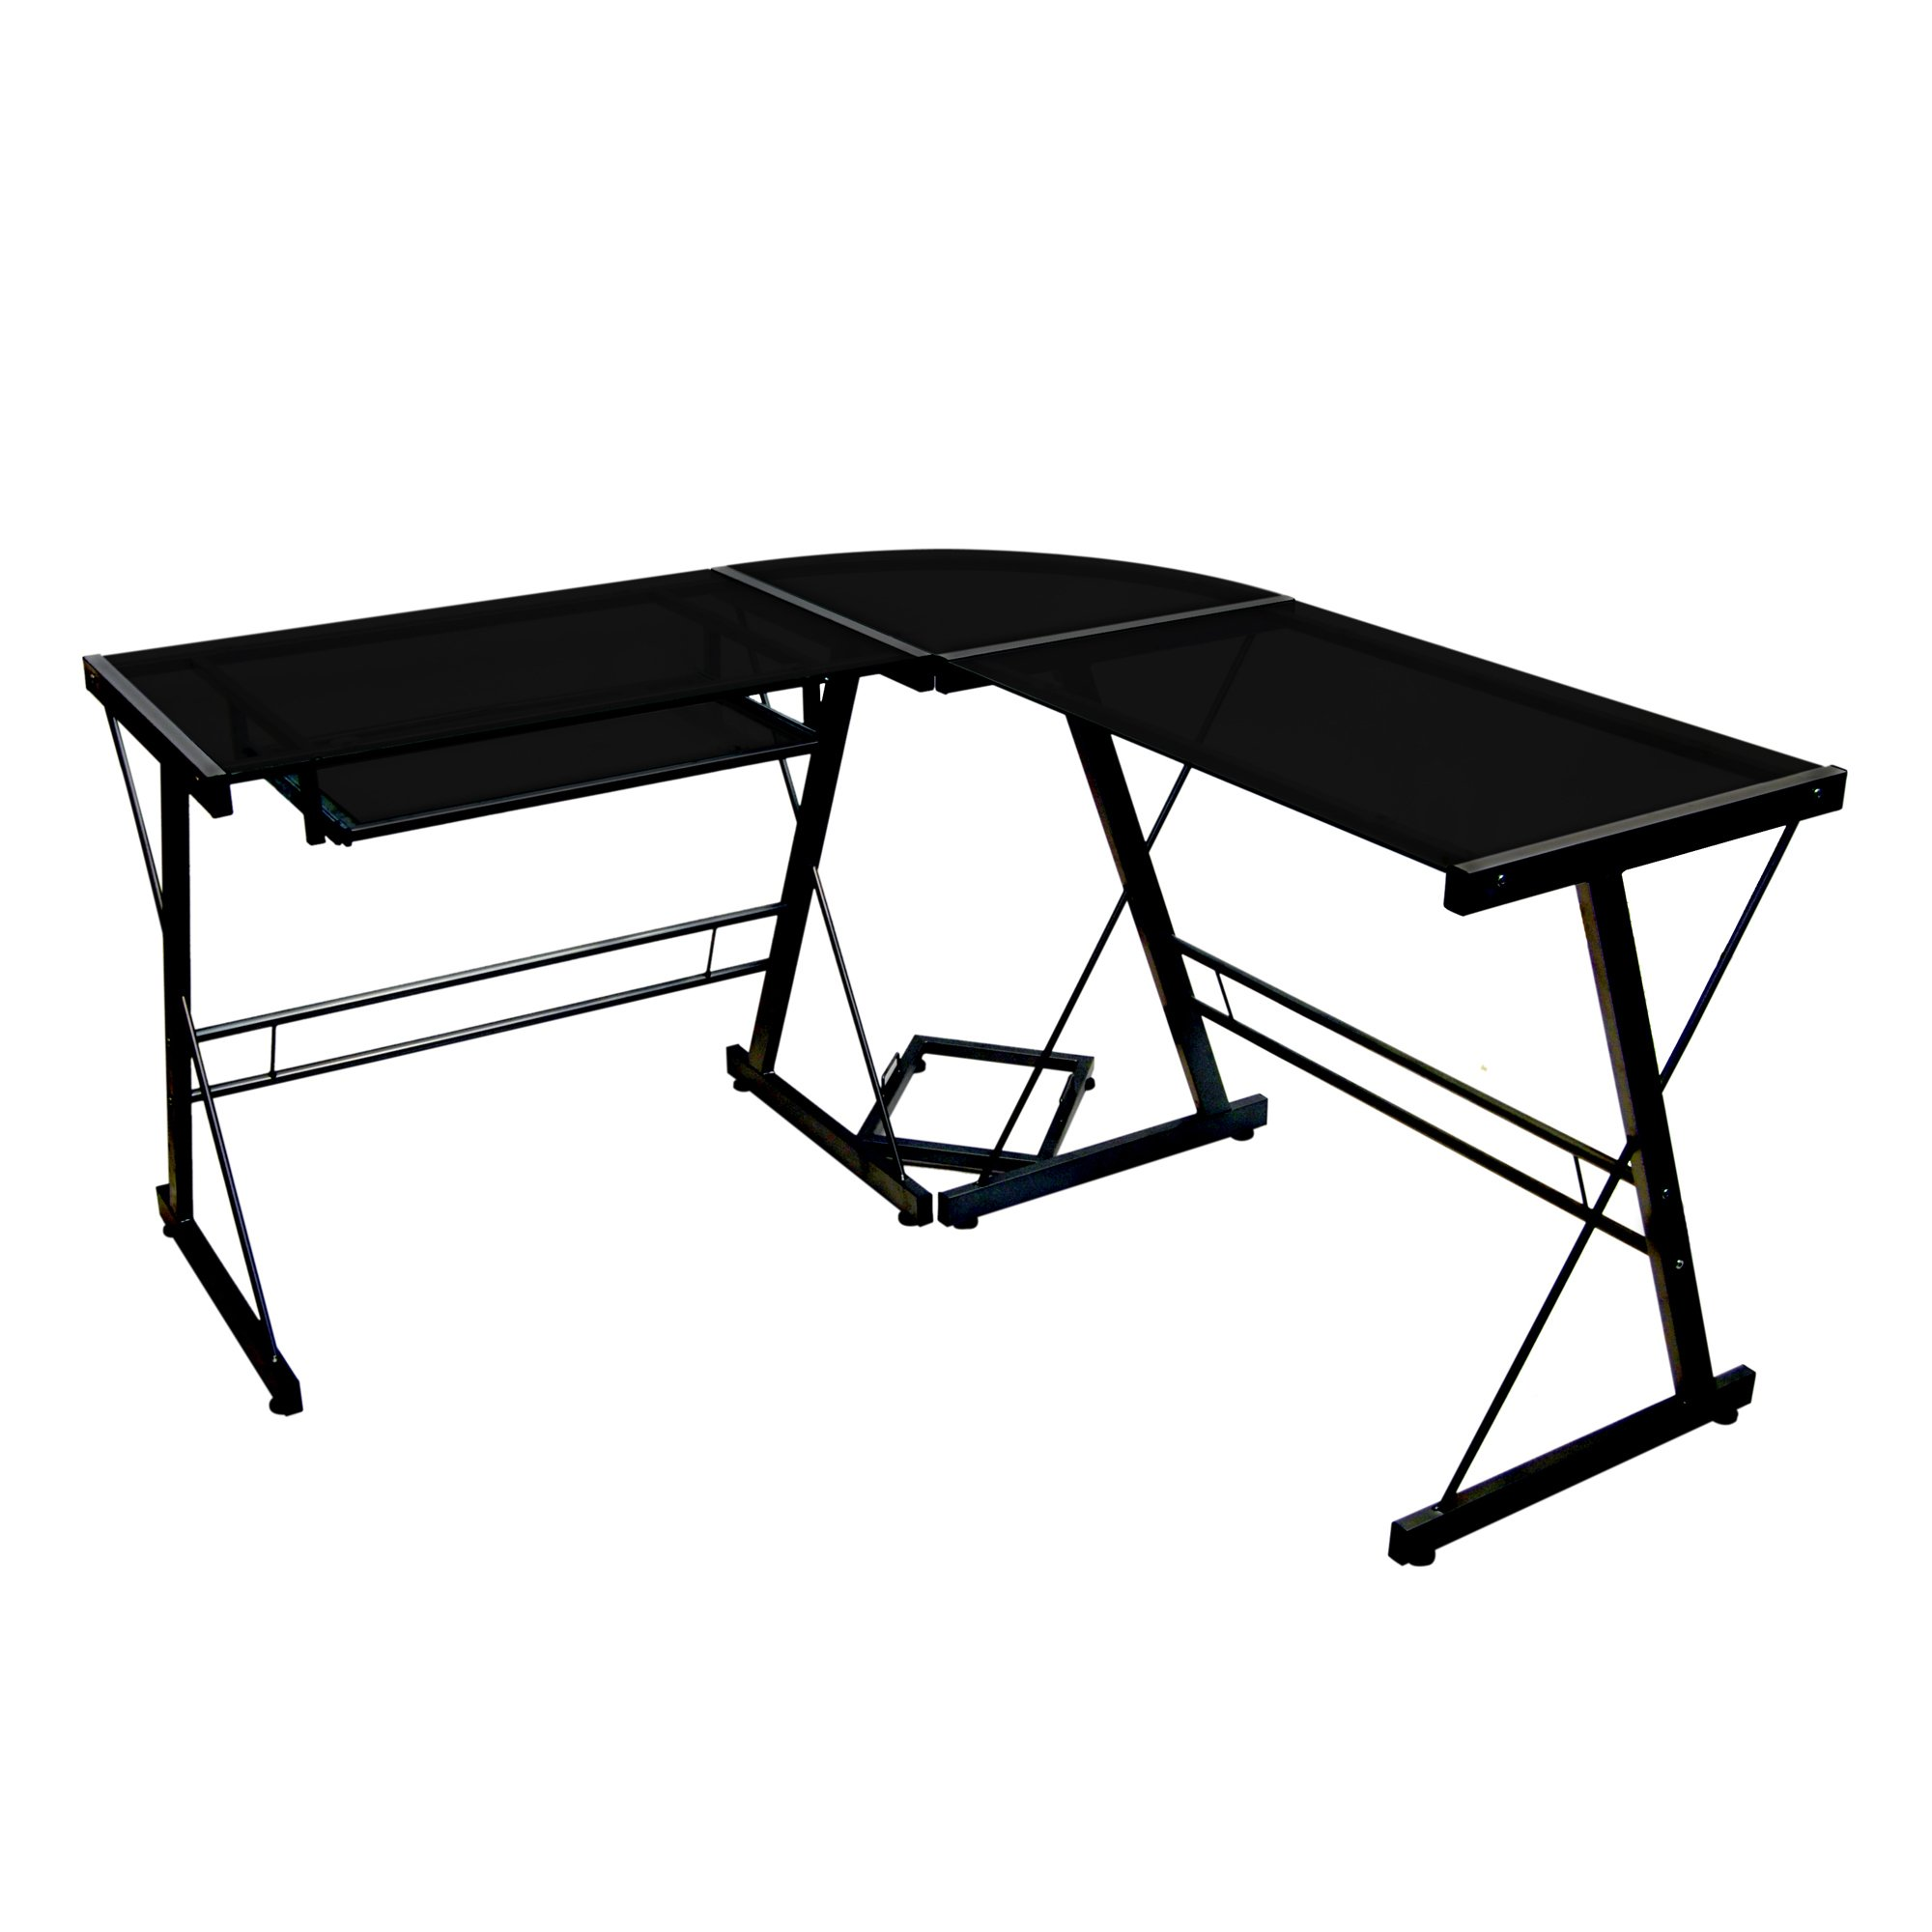 Walker Edison Soreno Modern 3-Piece Corner Desk for Home Office, Black Glass Contemporary Reclaimed Look by Walker Edison Furniture Company